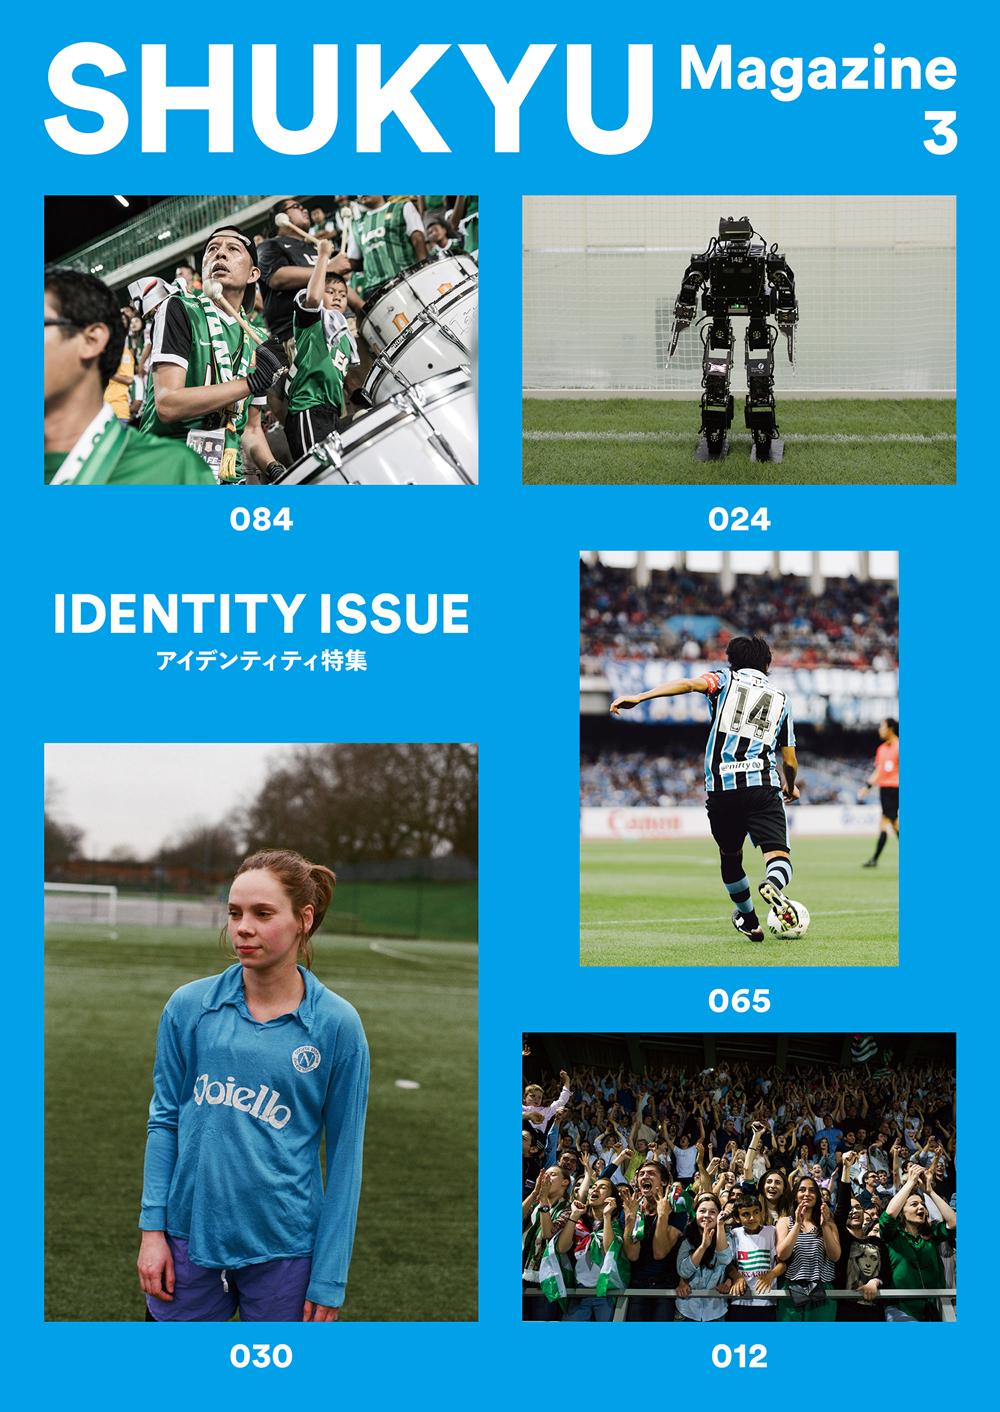 「shukyu magazine」の画像検索結果